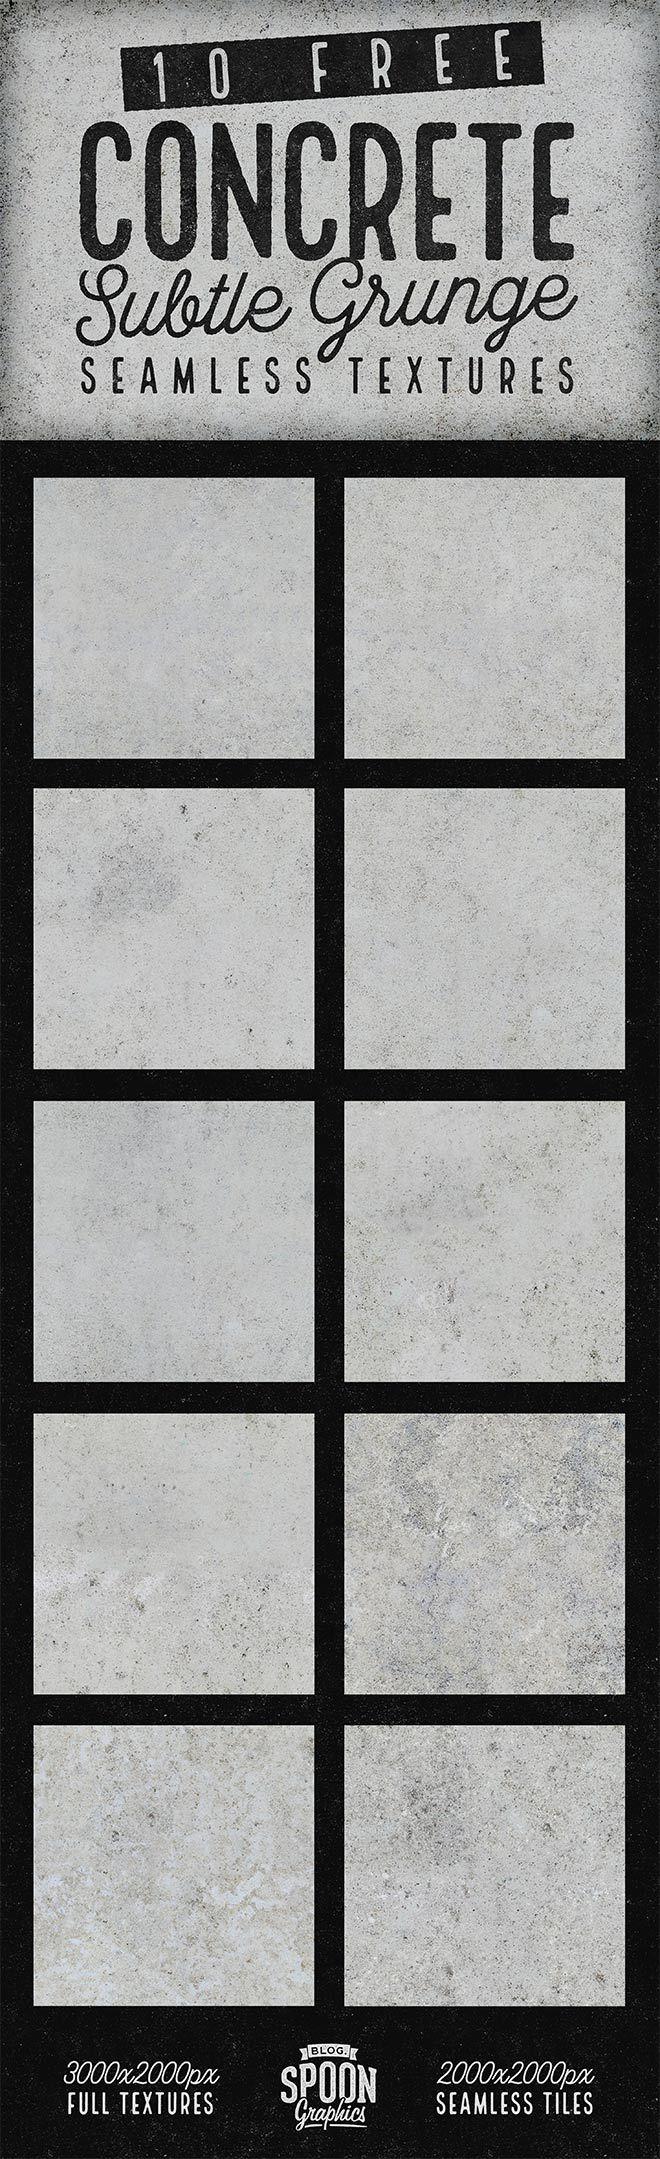 Textures architecture roads roads dirt road texture seamless - 10 Free Seamless Subtle Grunge Concrete Textures